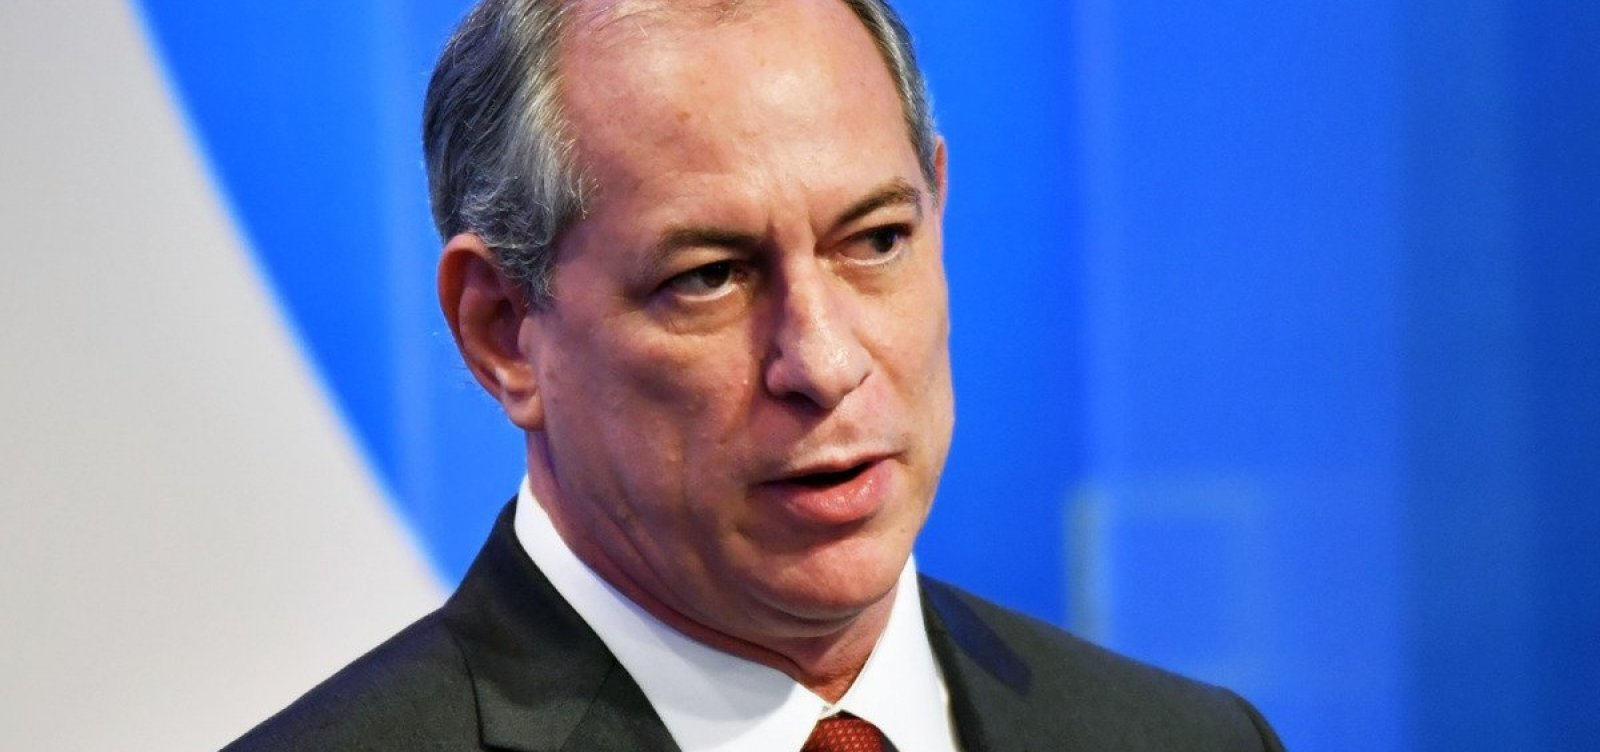 Ciro Gomes critica projeto de autonomia do Banco Central: 'Profundo golpe contra o destino do Brasil'